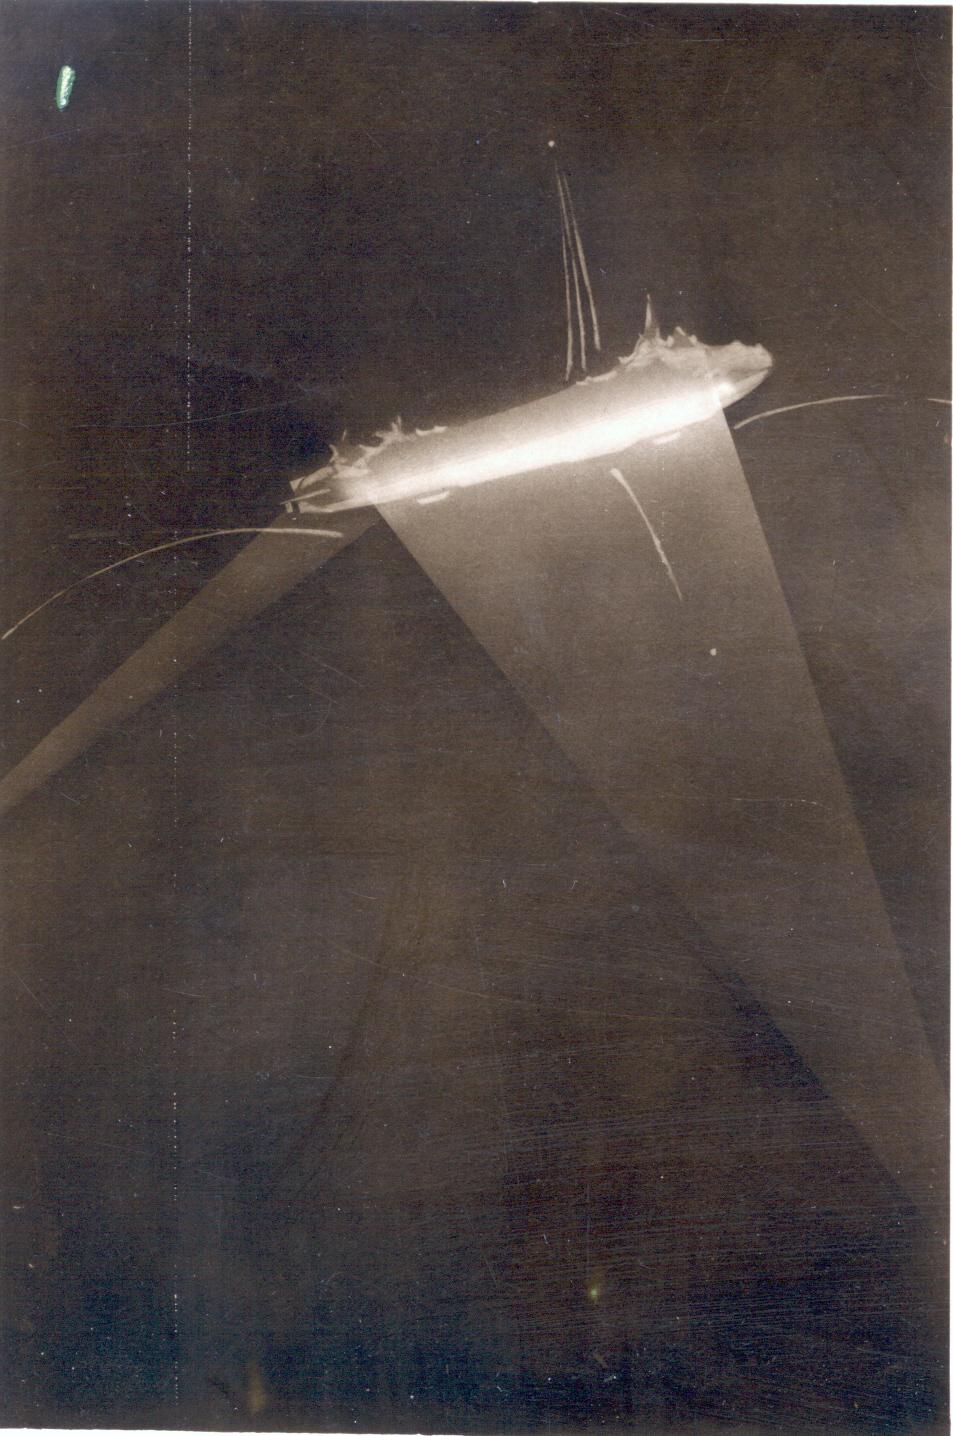 Zeppelin L34 under attack off Hartlepool, 27/28 November 1916